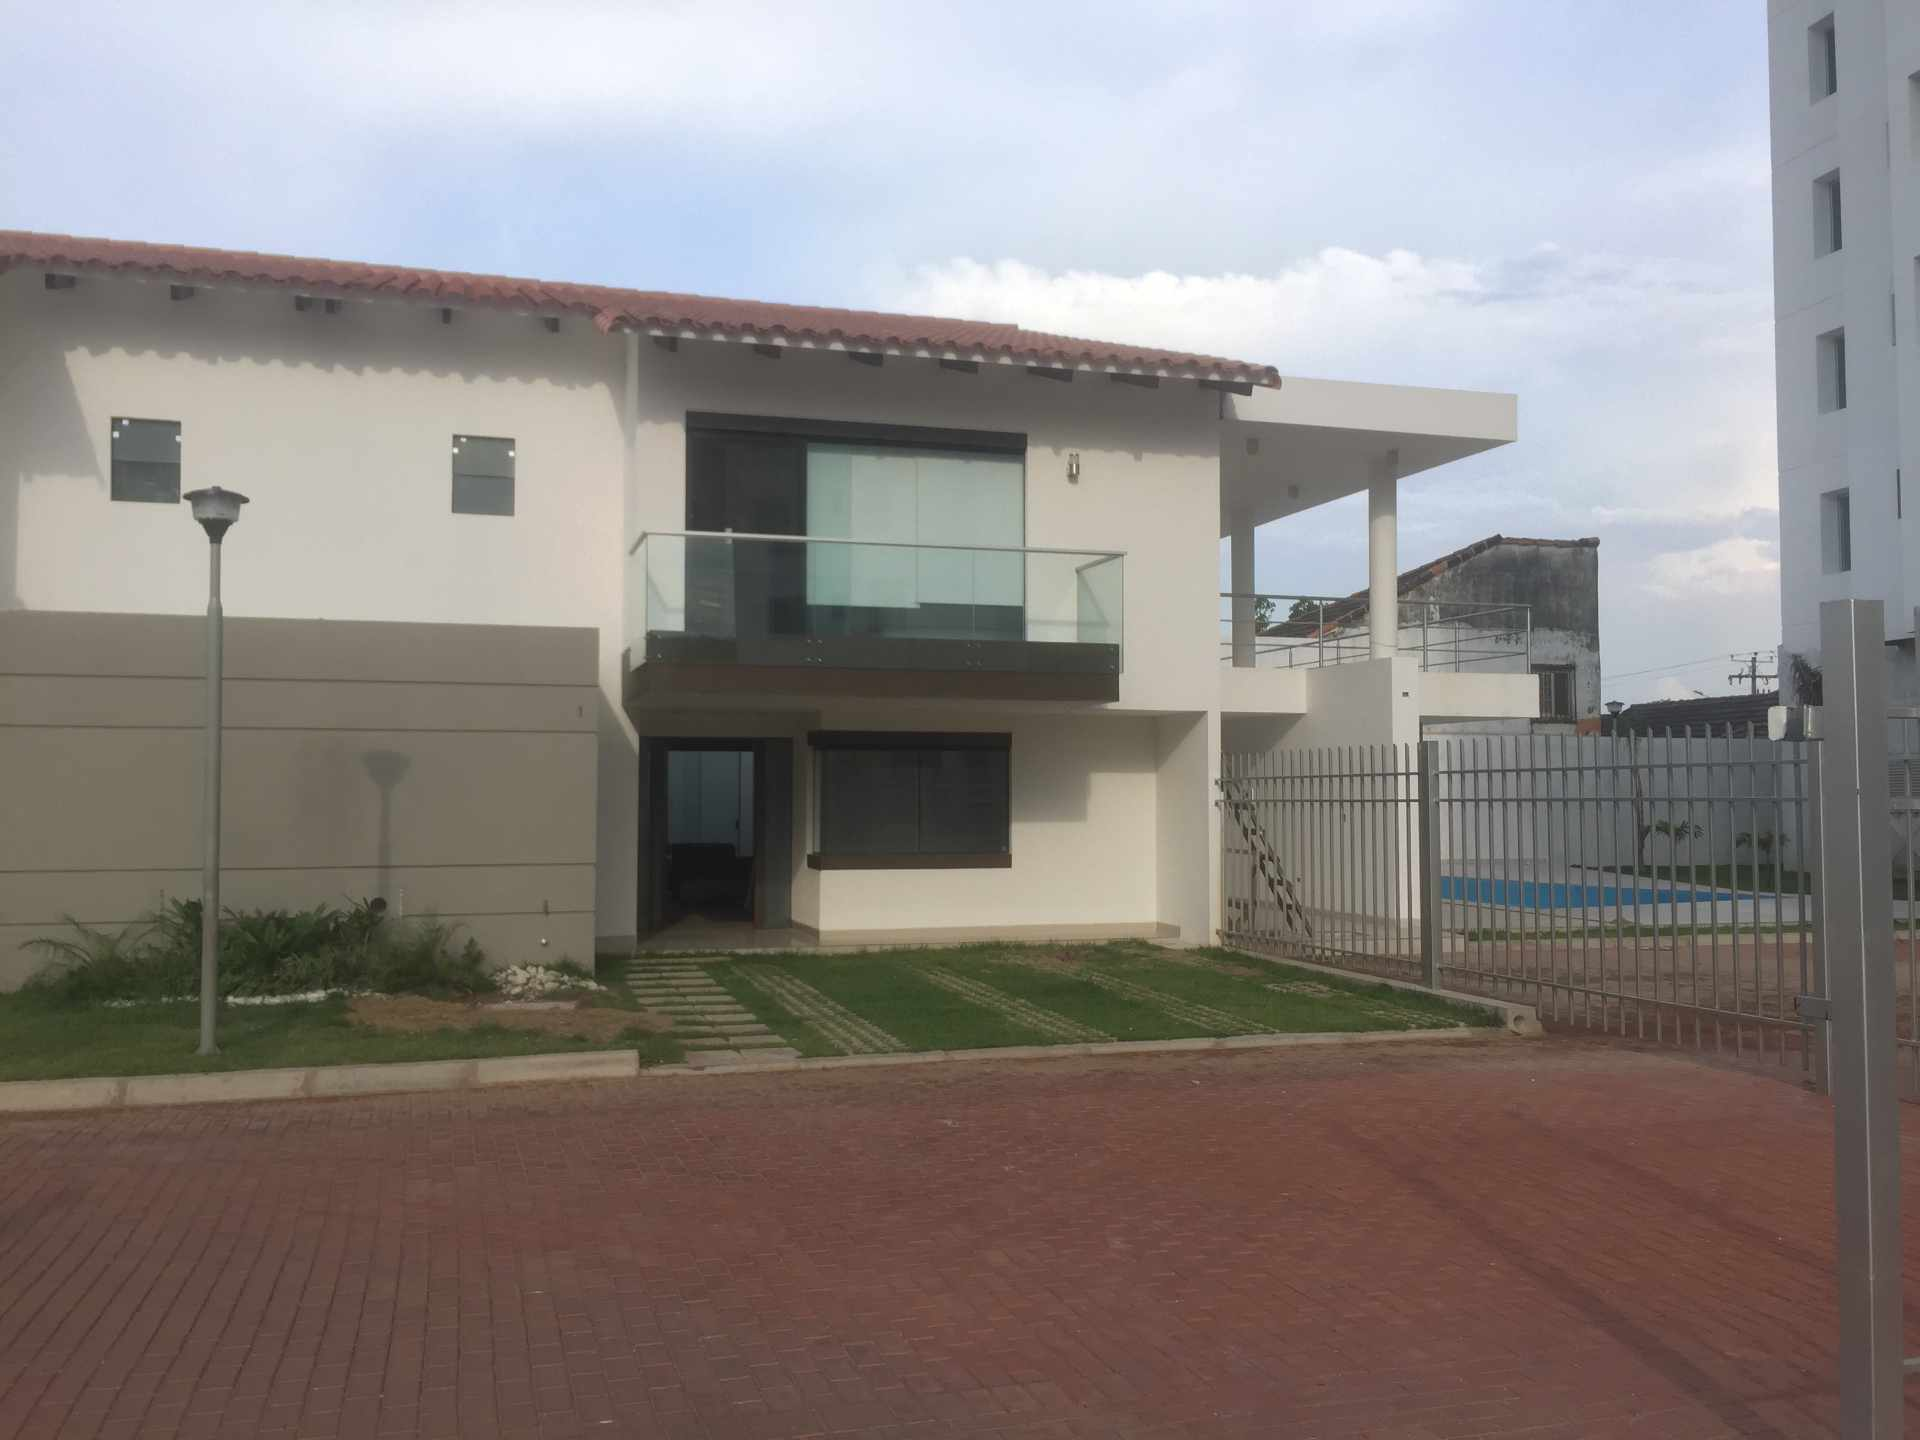 Casa en Alquiler Av. Pirai entre 4to y 5to anillo Cond. Santa Monica Foto 1